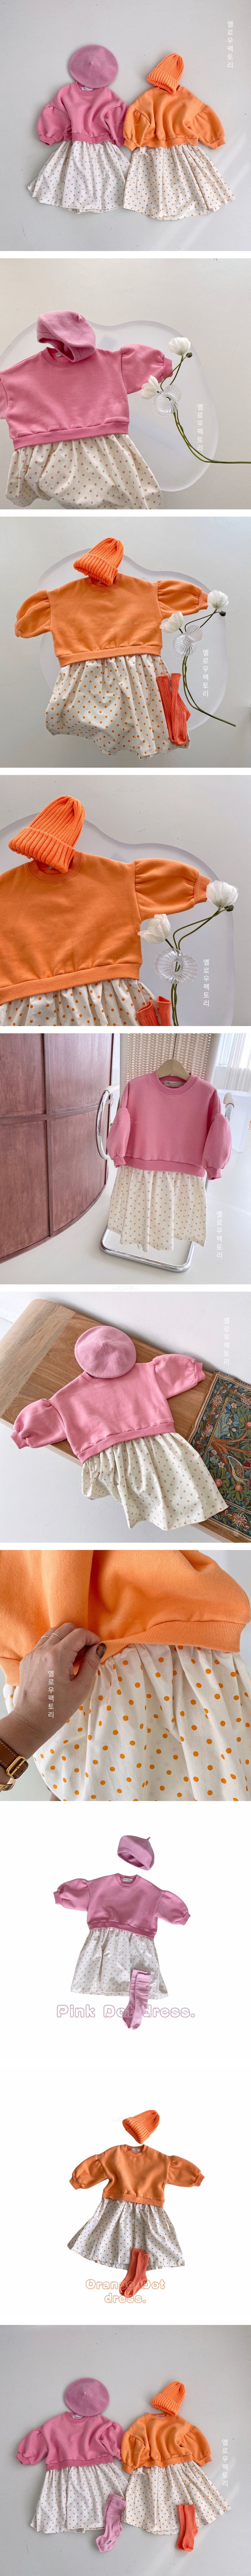 YELLOW FACTORY - Korean Children Fashion - #Kfashion4kids - Marble One-piece